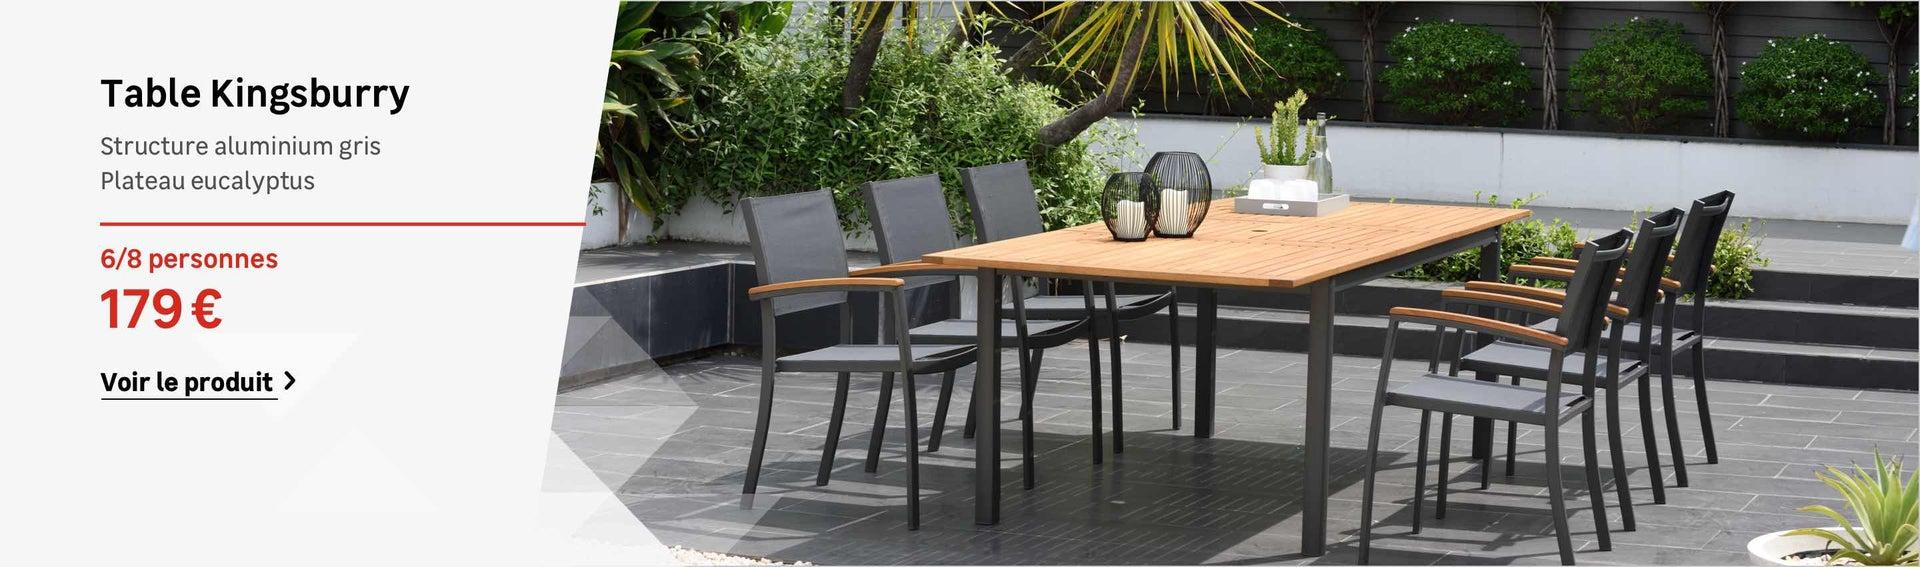 Table Et Chaise De Jardin Aluminium Inspirant Table Et ... pour Table Et Chaises De Jardin Pas Cher